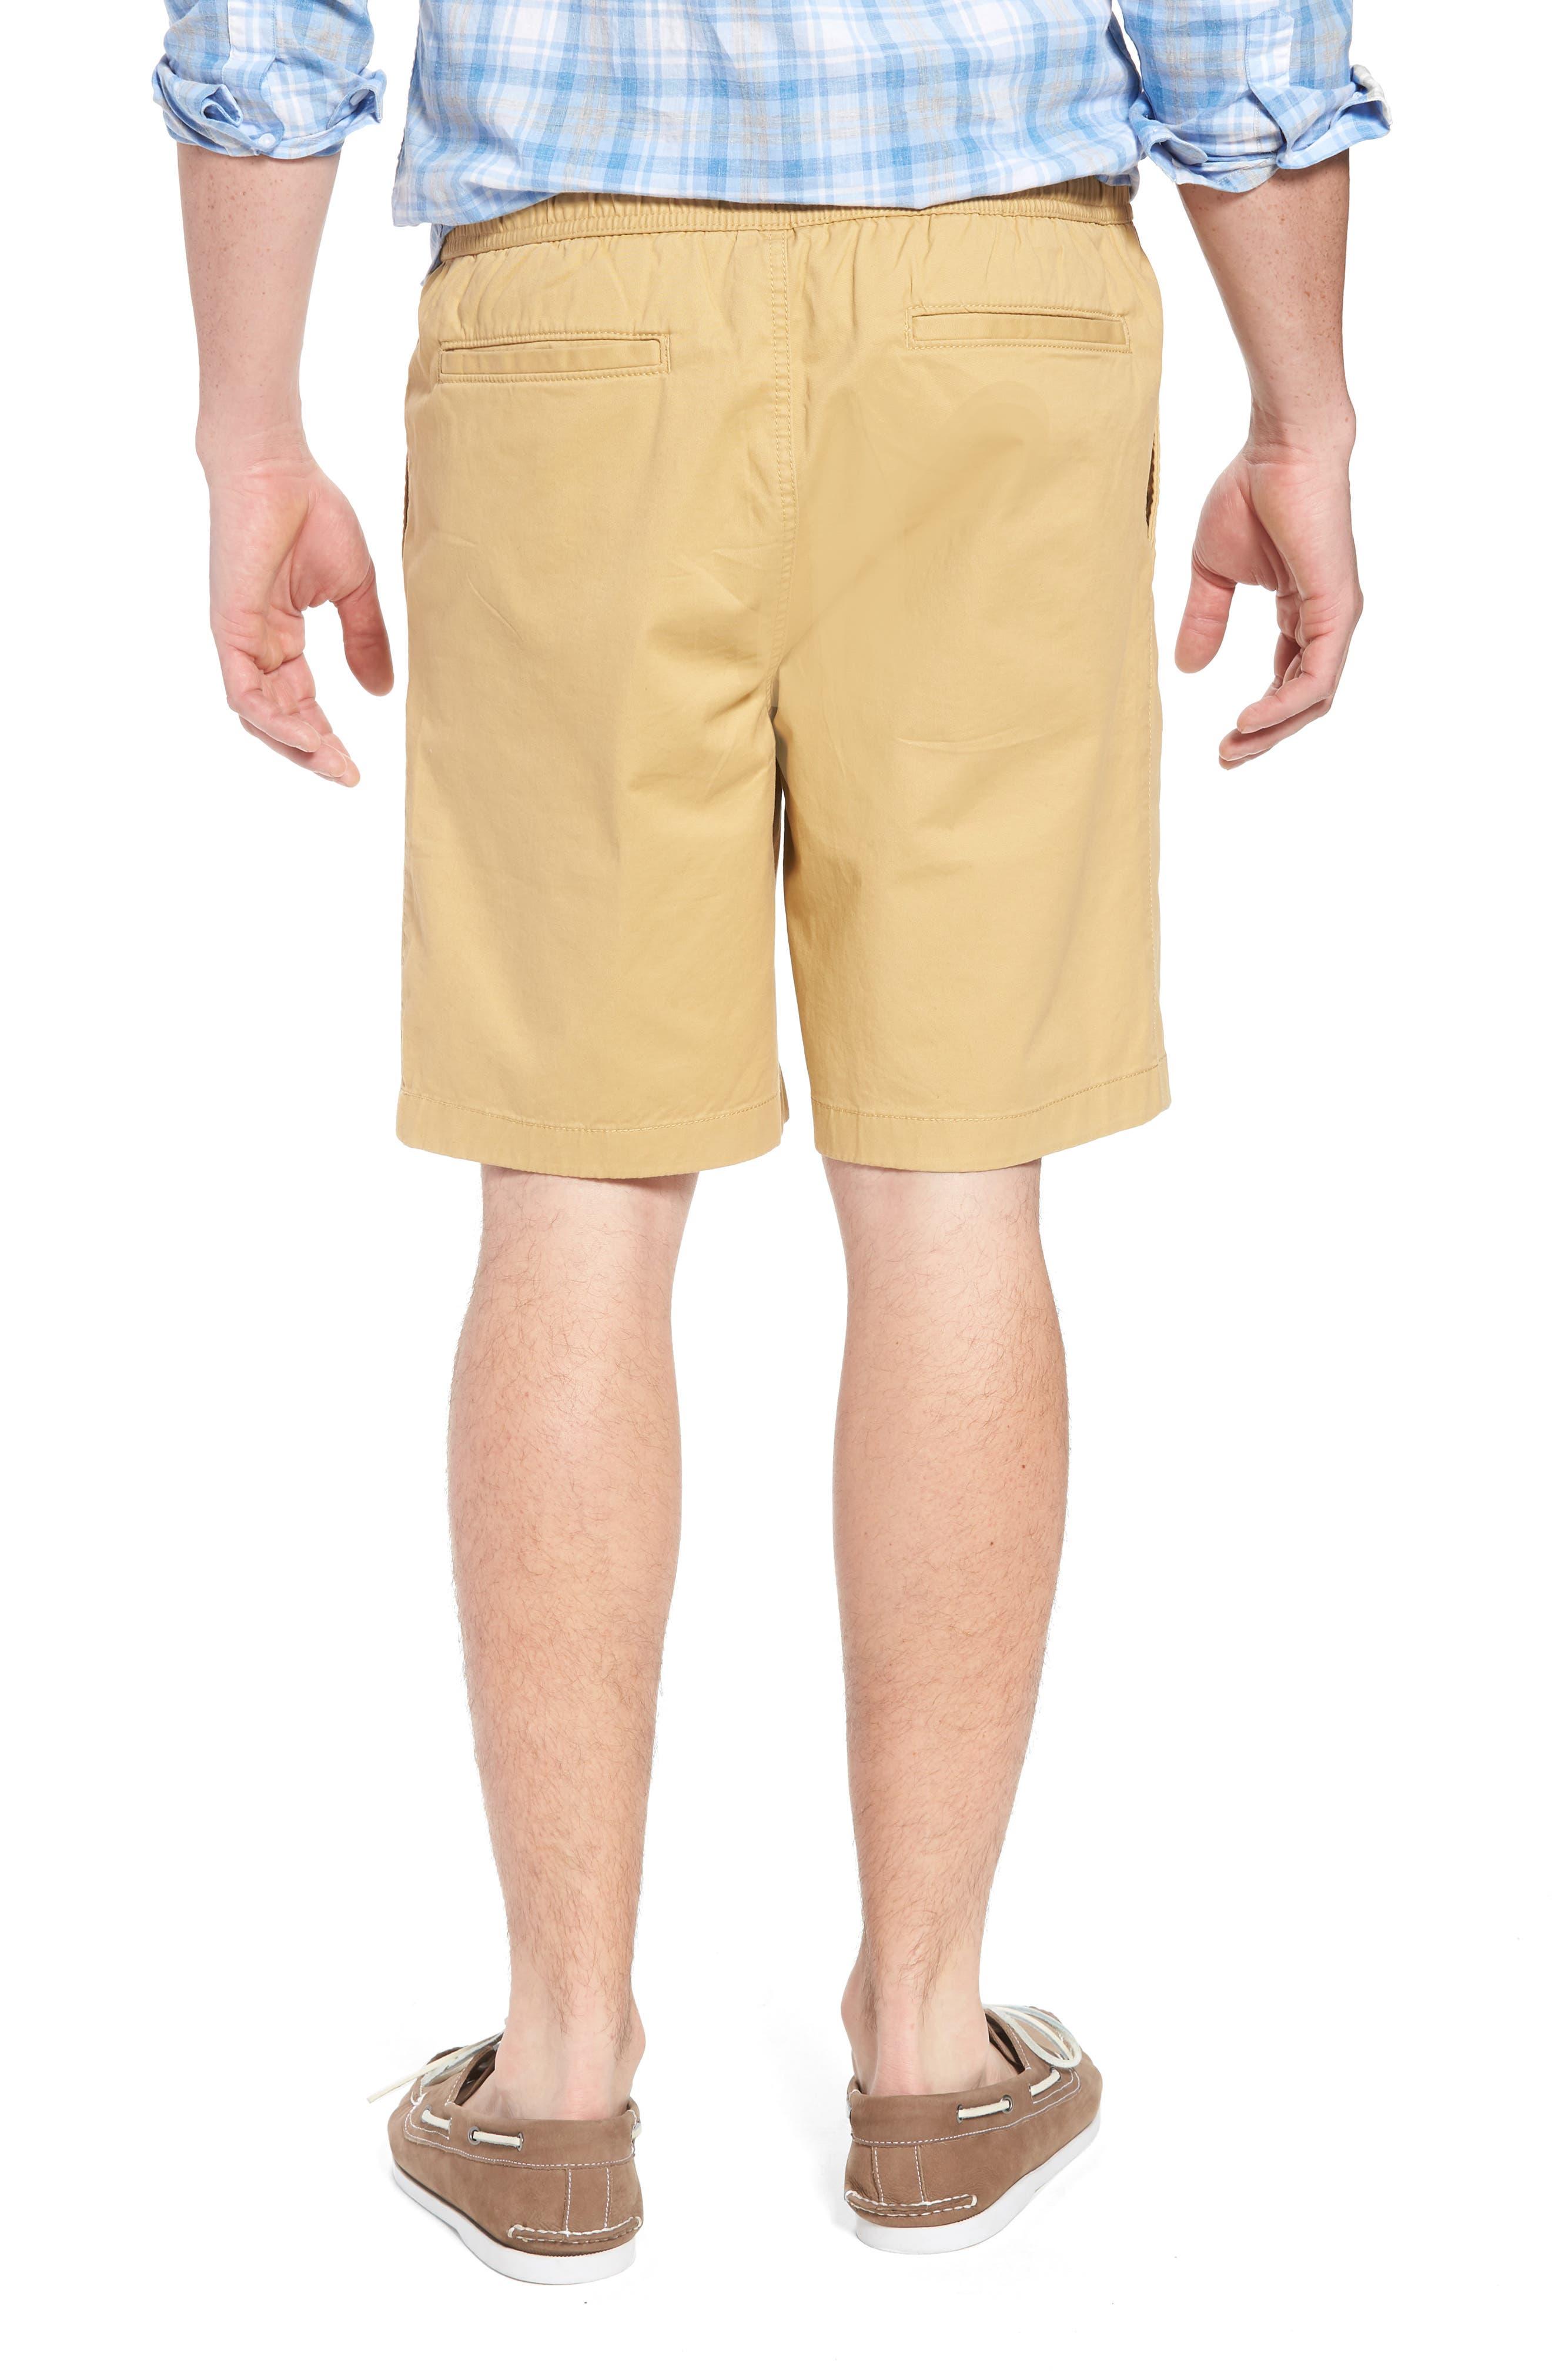 Ballard Slim Fit Shorts,                             Alternate thumbnail 2, color,                             Tan Lark